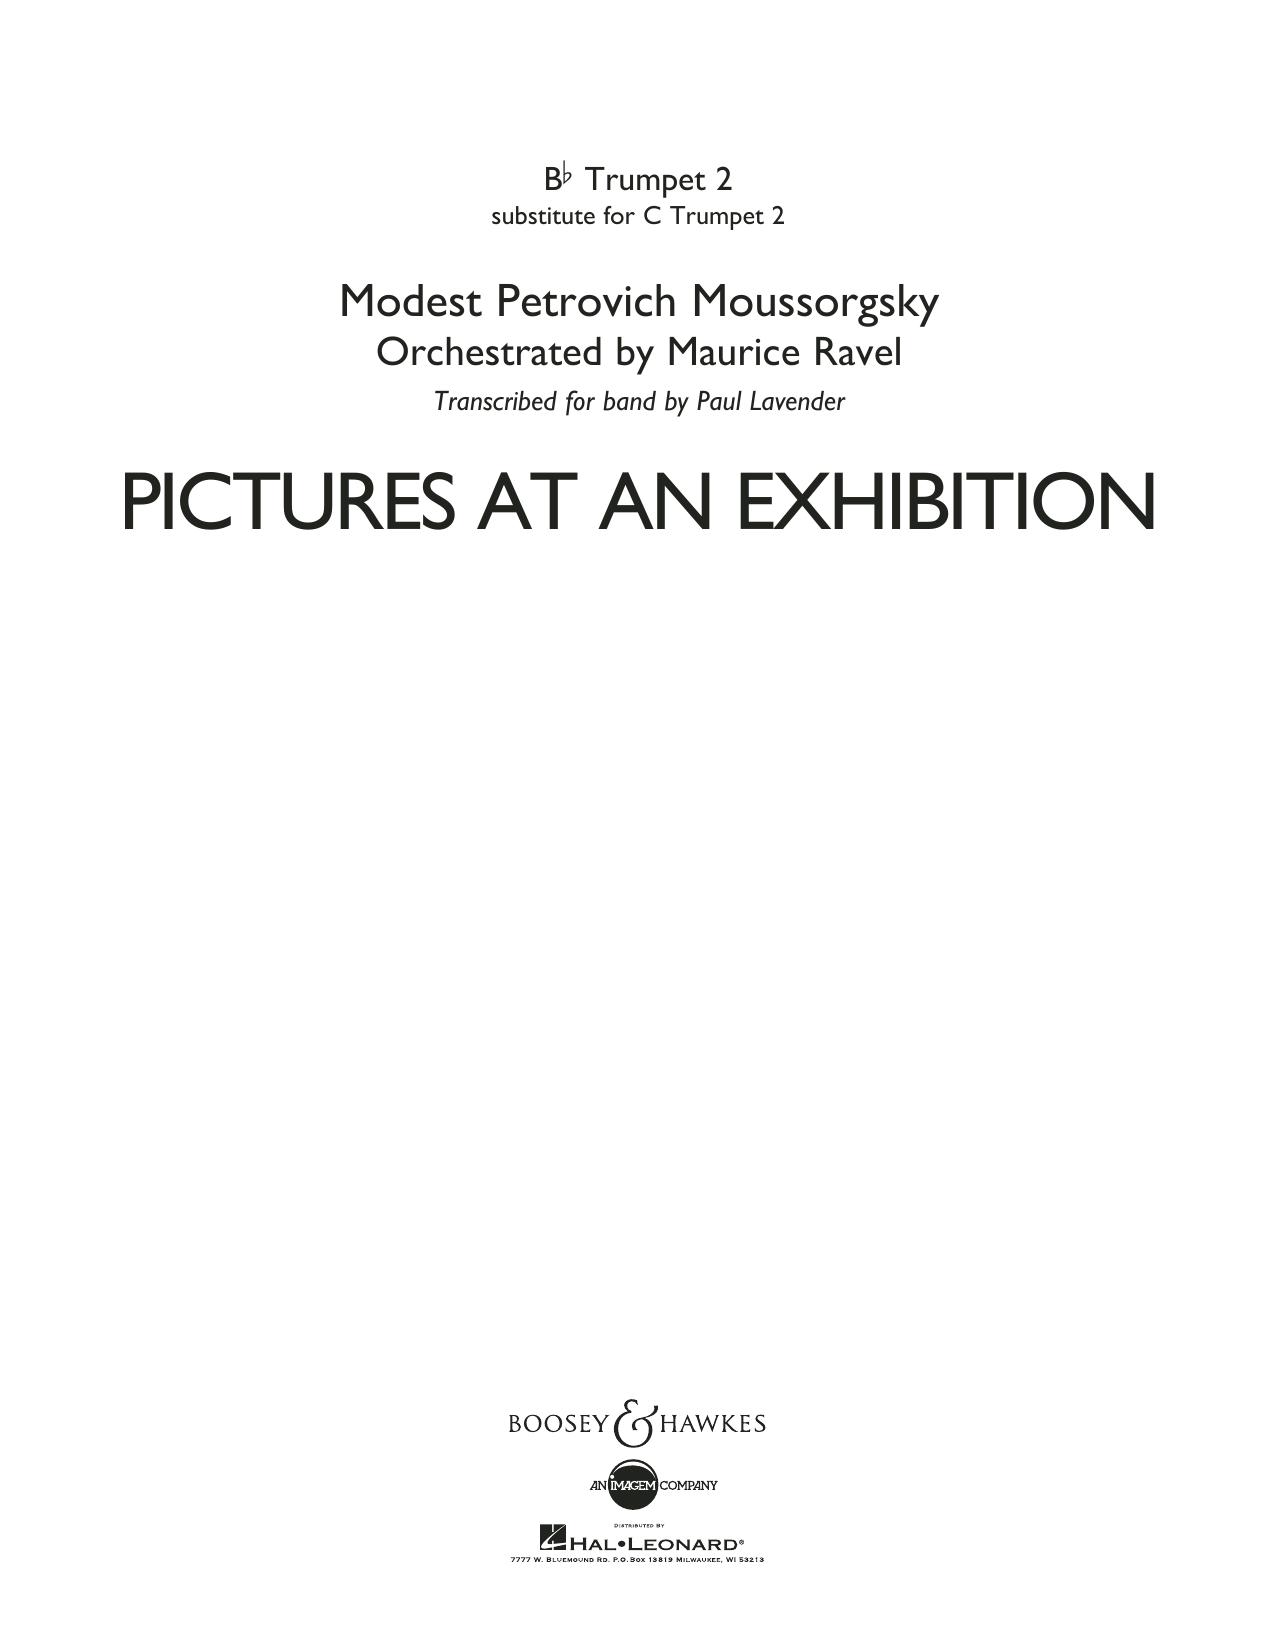 Pictures at an Exhibition - Bb Trumpet Parts - Digital Only - Bb Trumpet 2 (sub. C Tpt. 2) Partituras Digitales